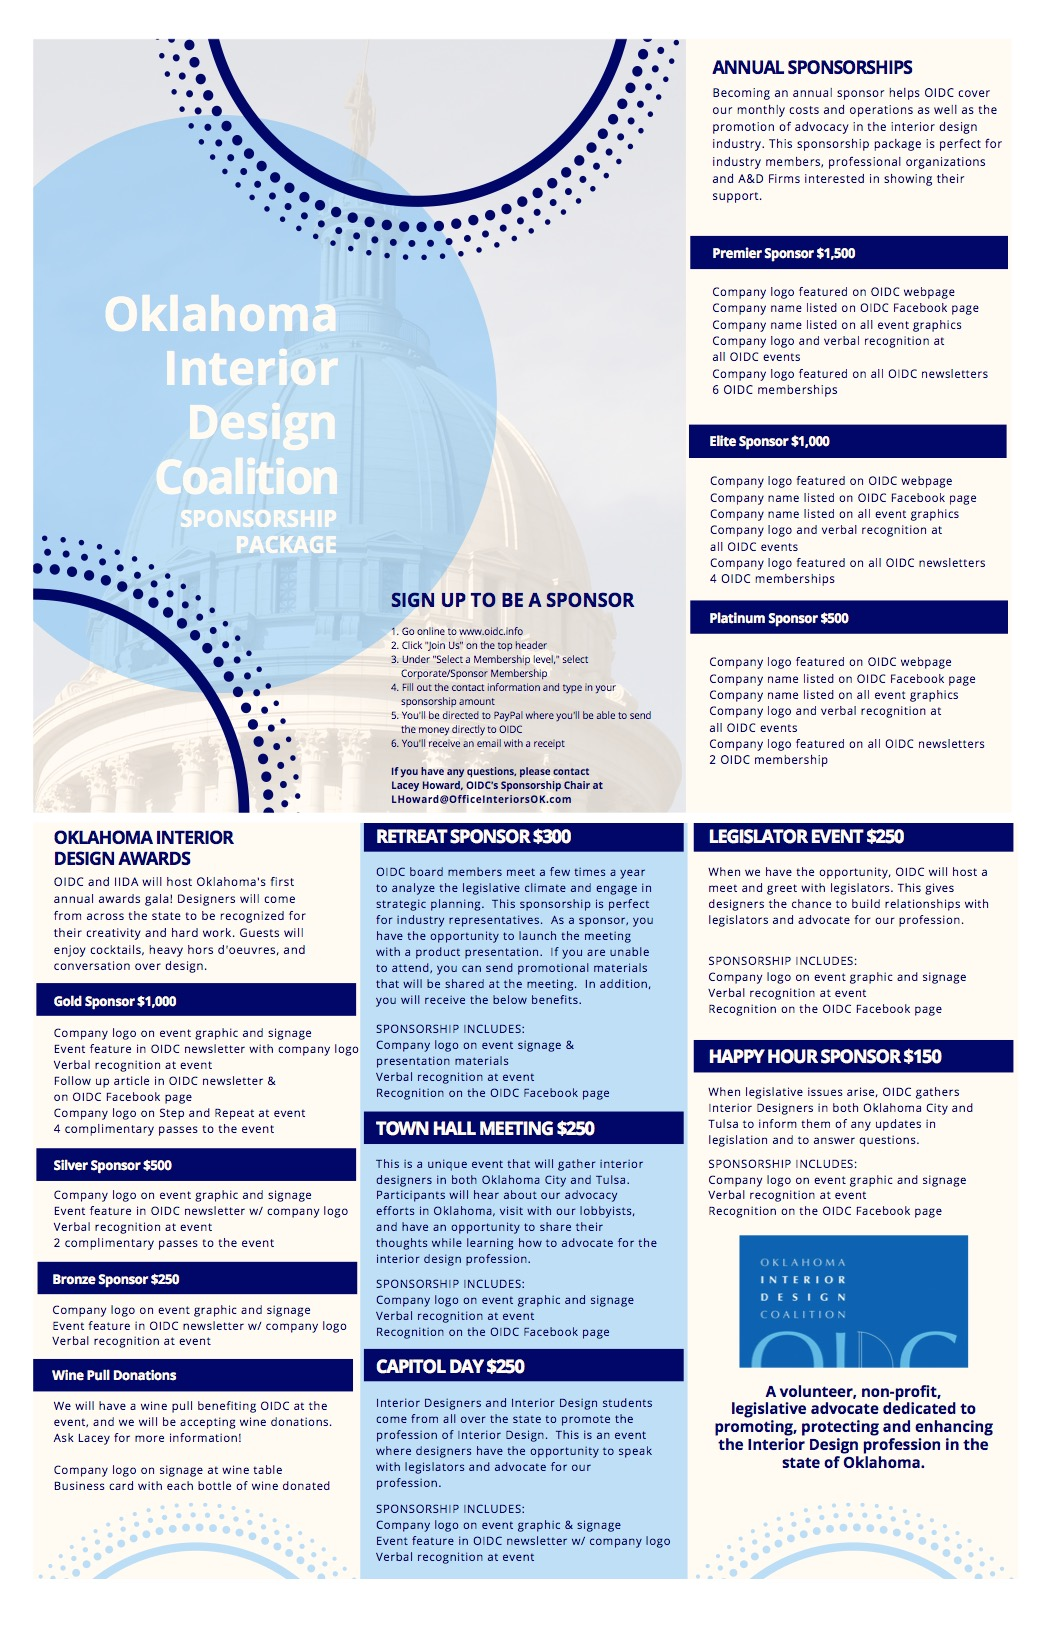 Sponsorship Info Oklahoma Interior Design Coalition